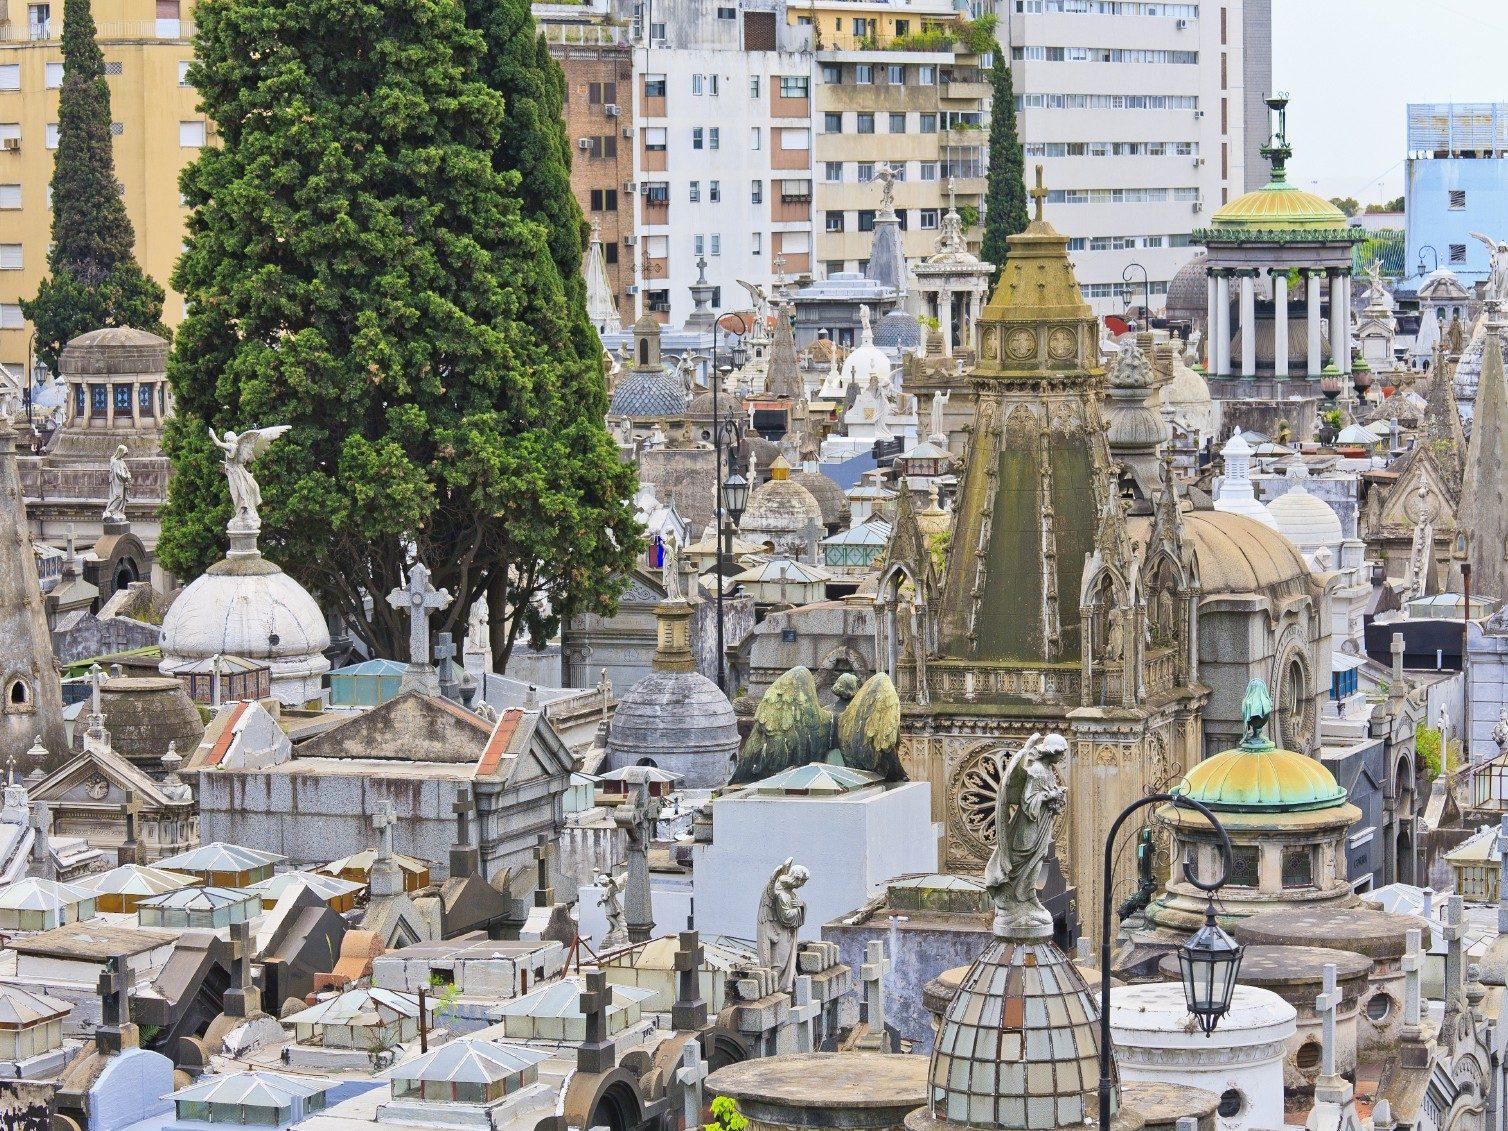 Cementerio de la Recoleta (Cimetière de Recoleta)